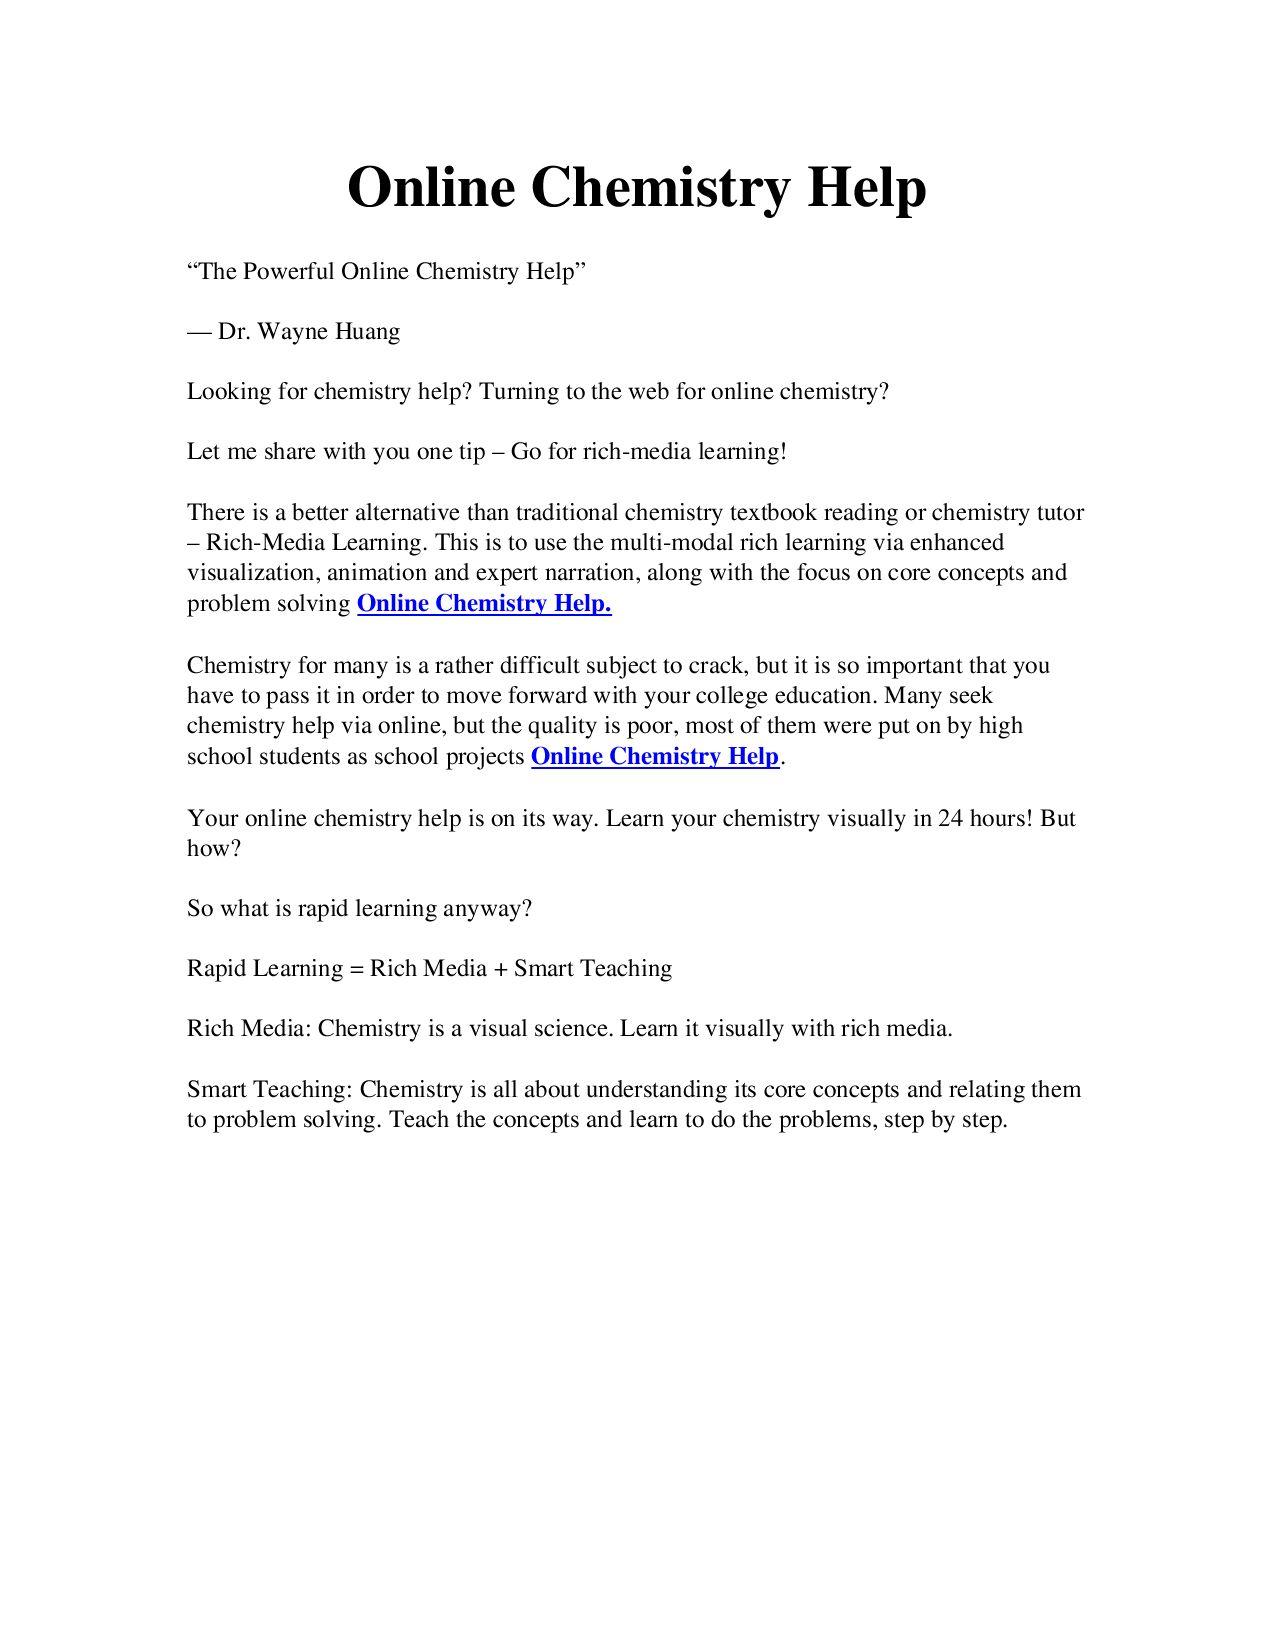 Online Chemistry Help By Michel Johnsi  Issuu